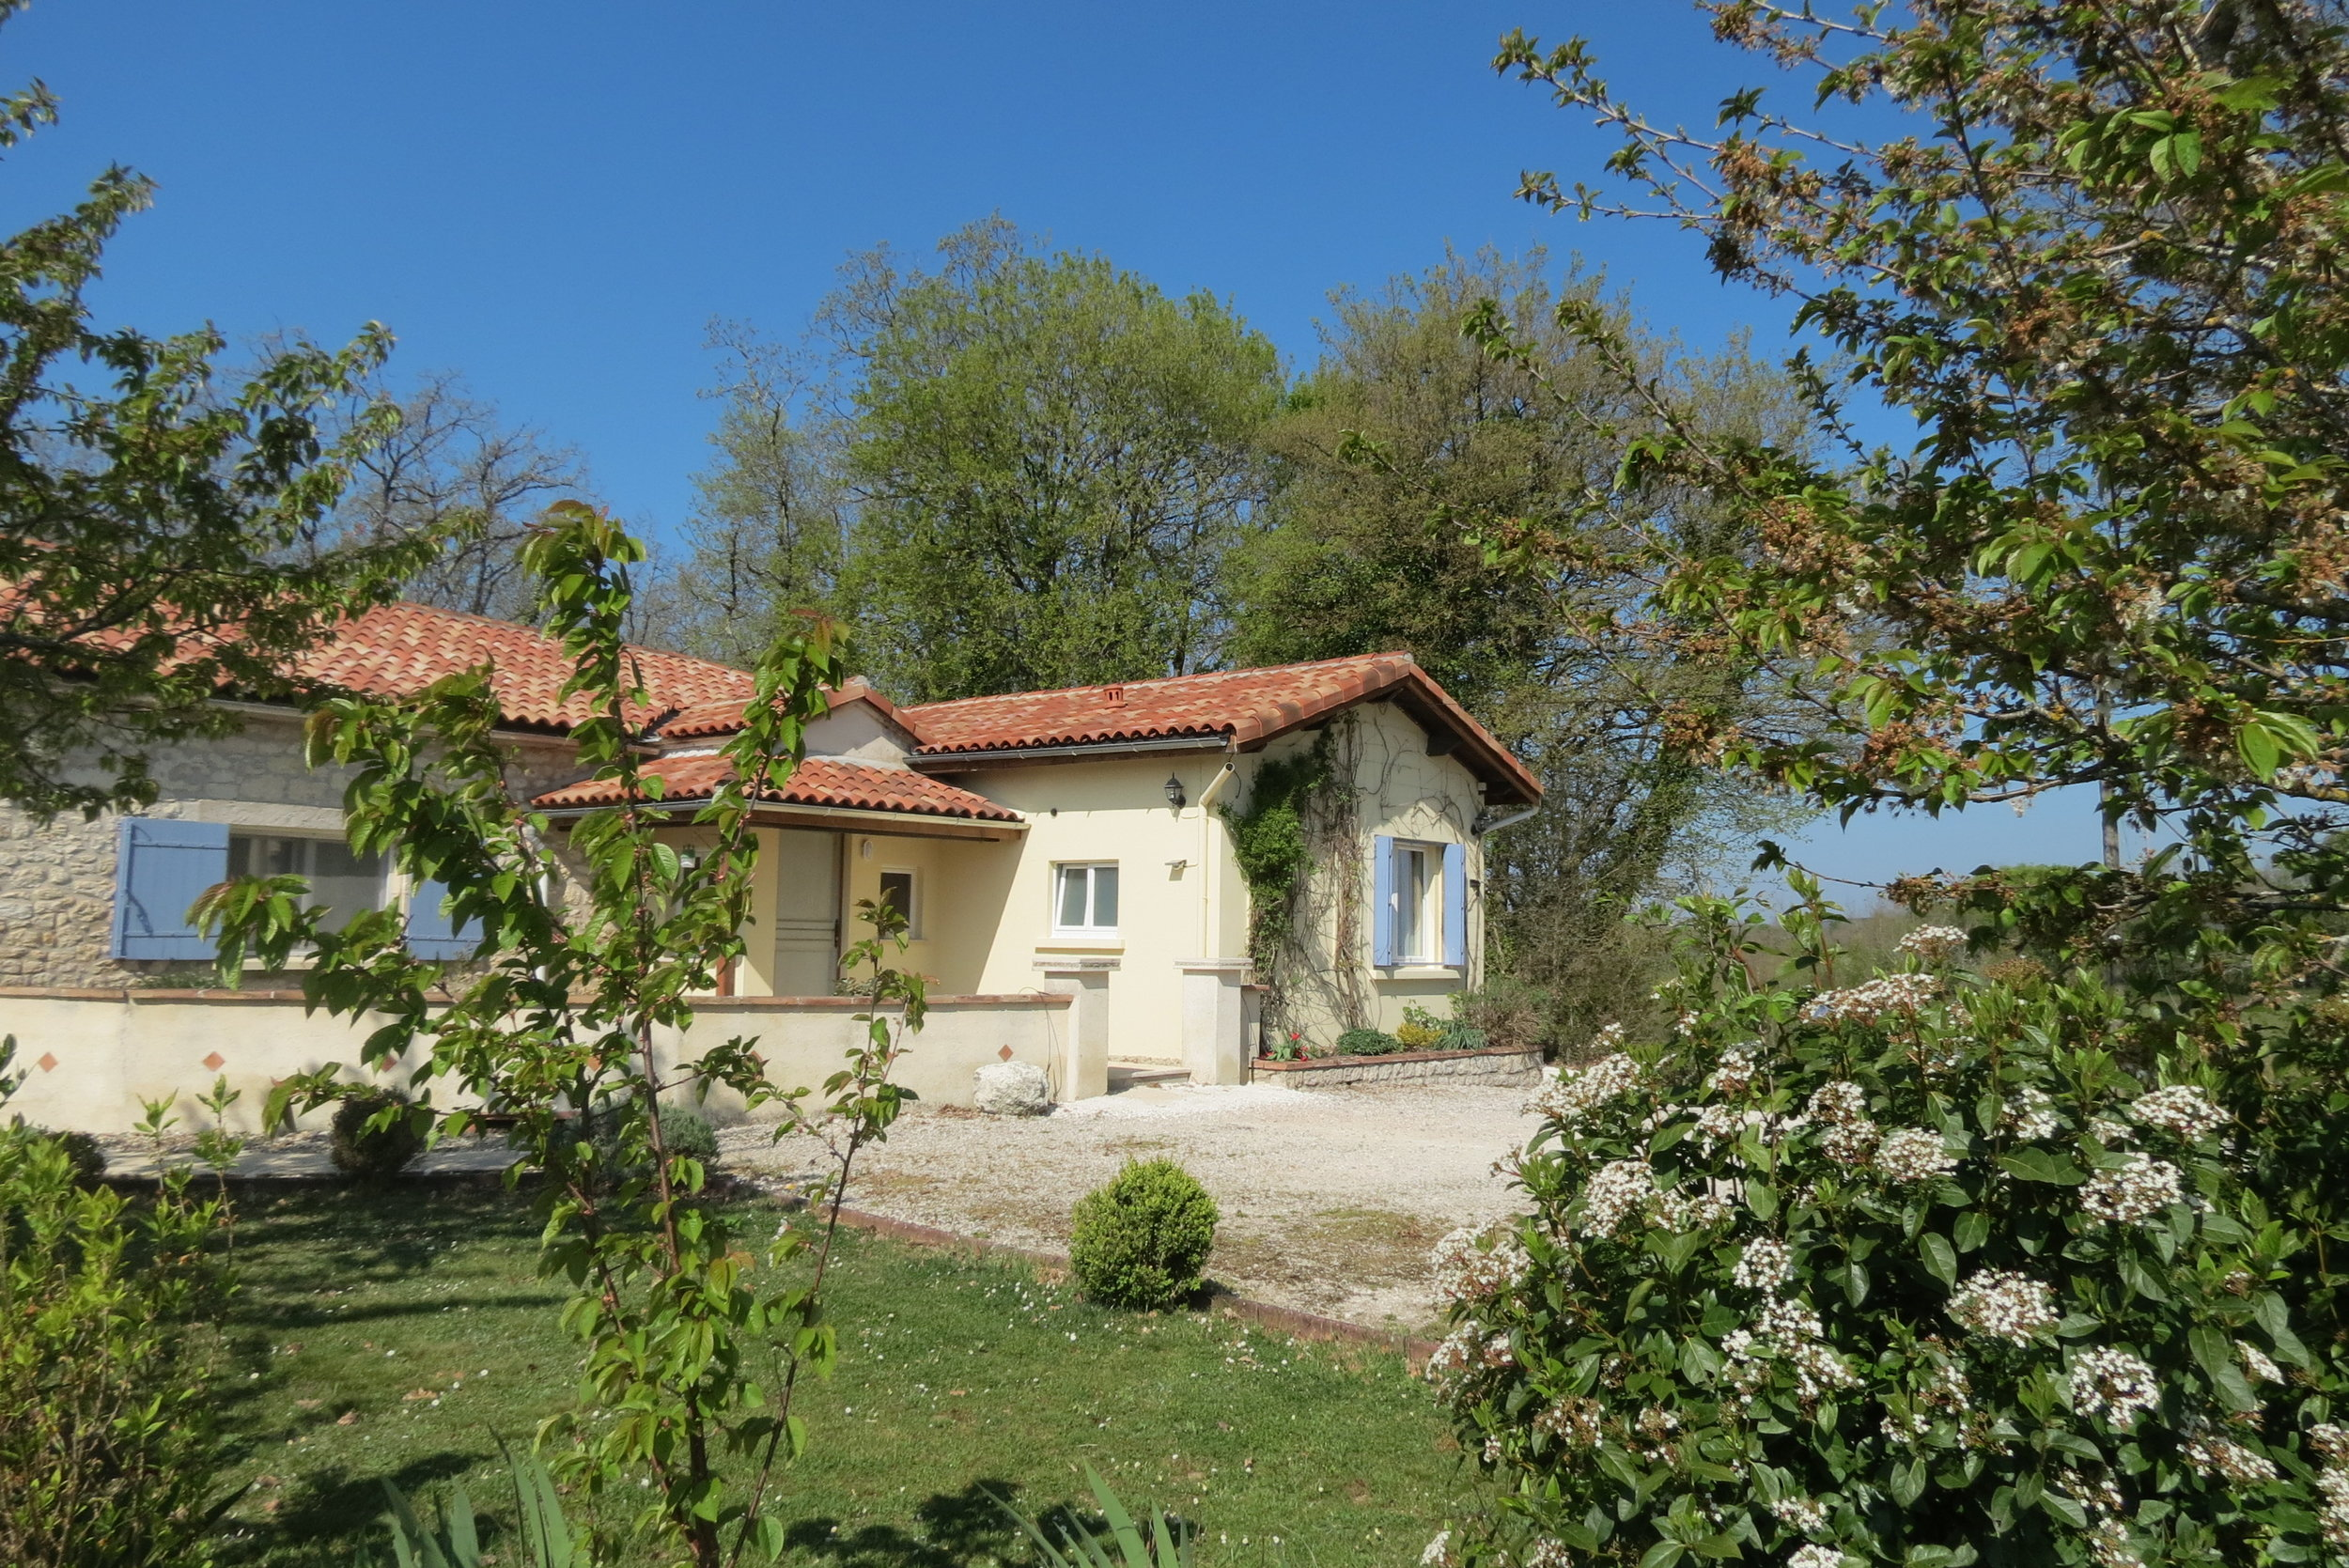 More about Le Cottage